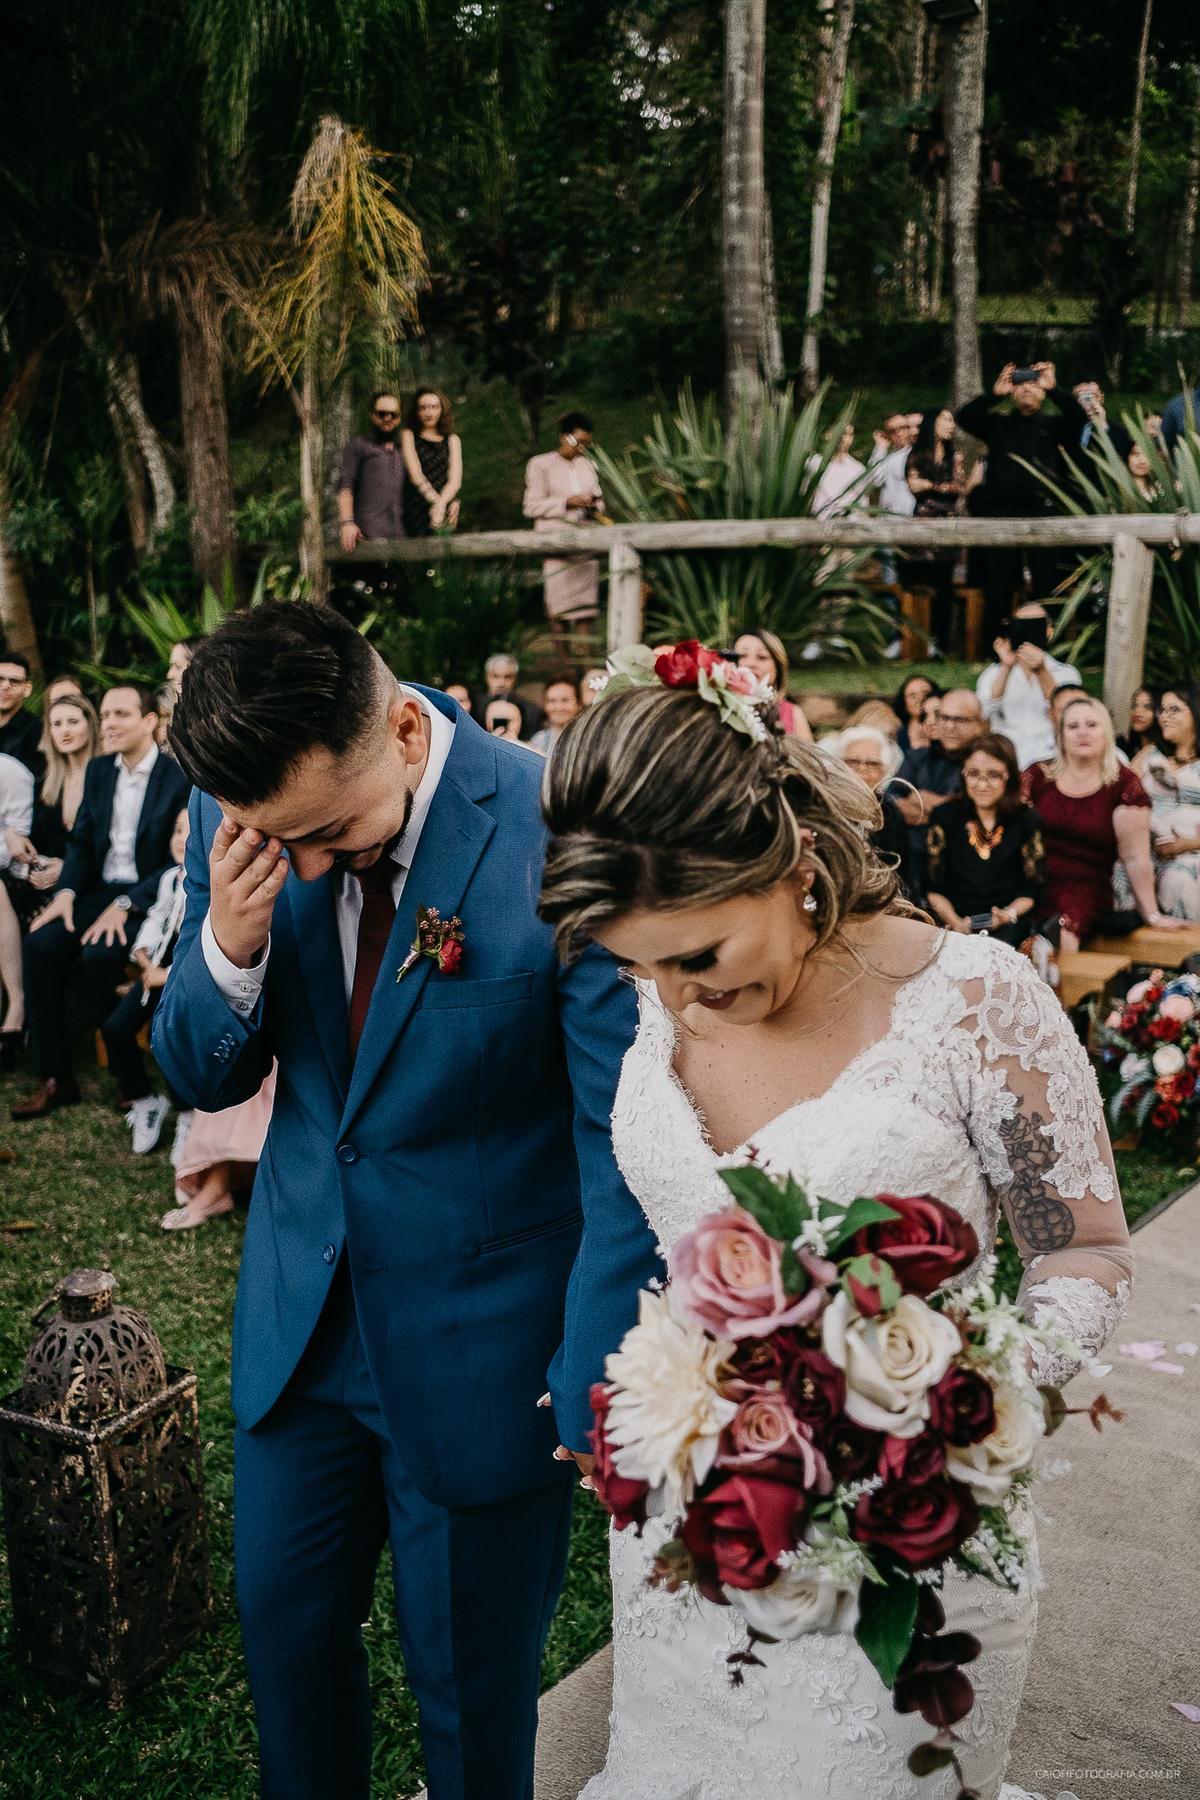 cerimonia de casamento rustico ao ar livre pai da noiva noivos estilosos inspiracao de casamento fotos por caio henrique  casar no campo ideias de fotos